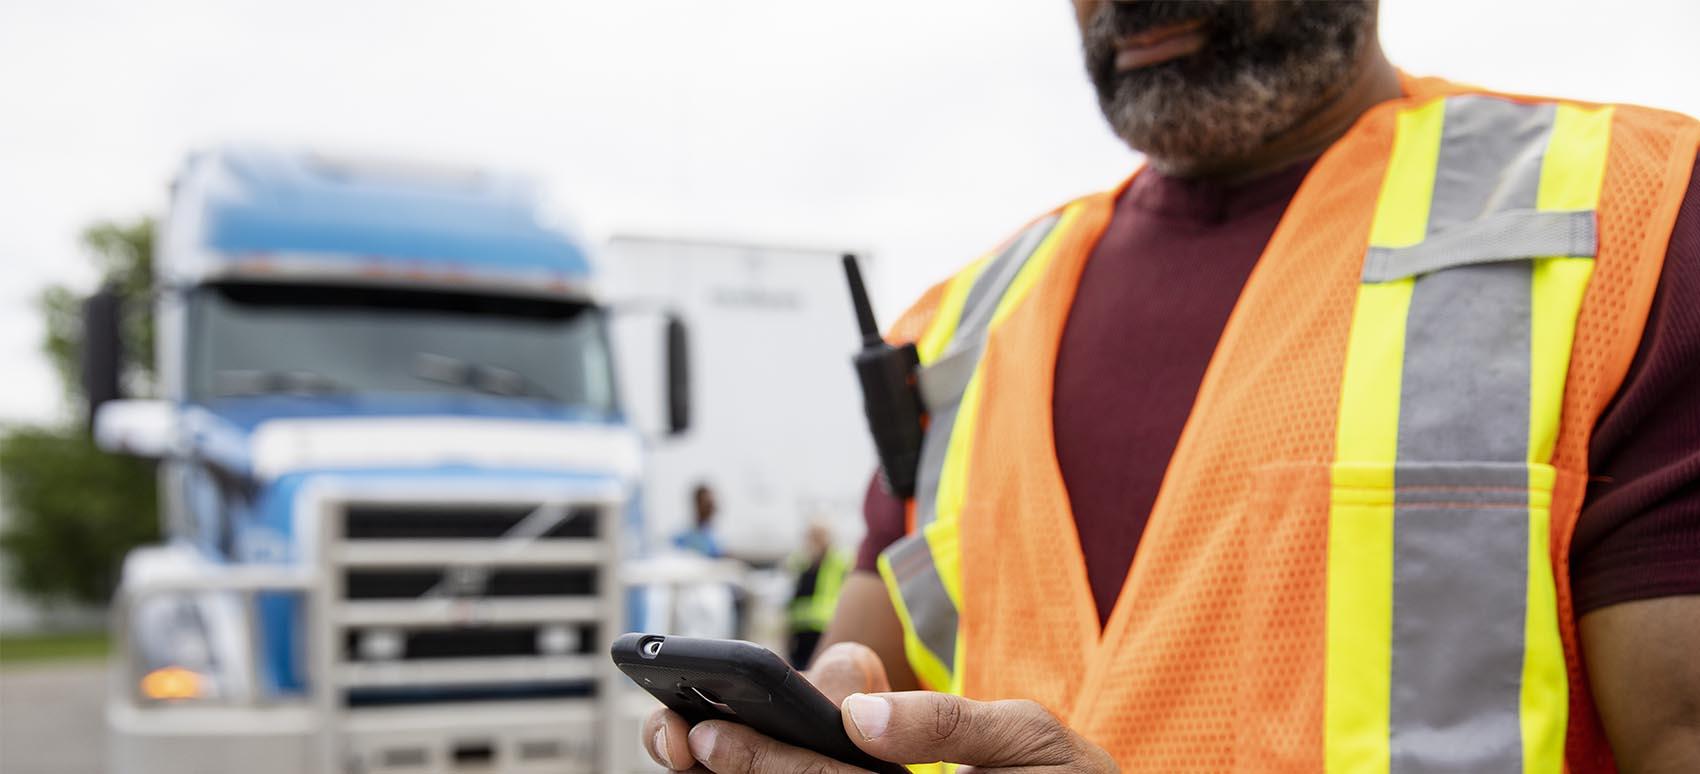 DSV trucker on phone